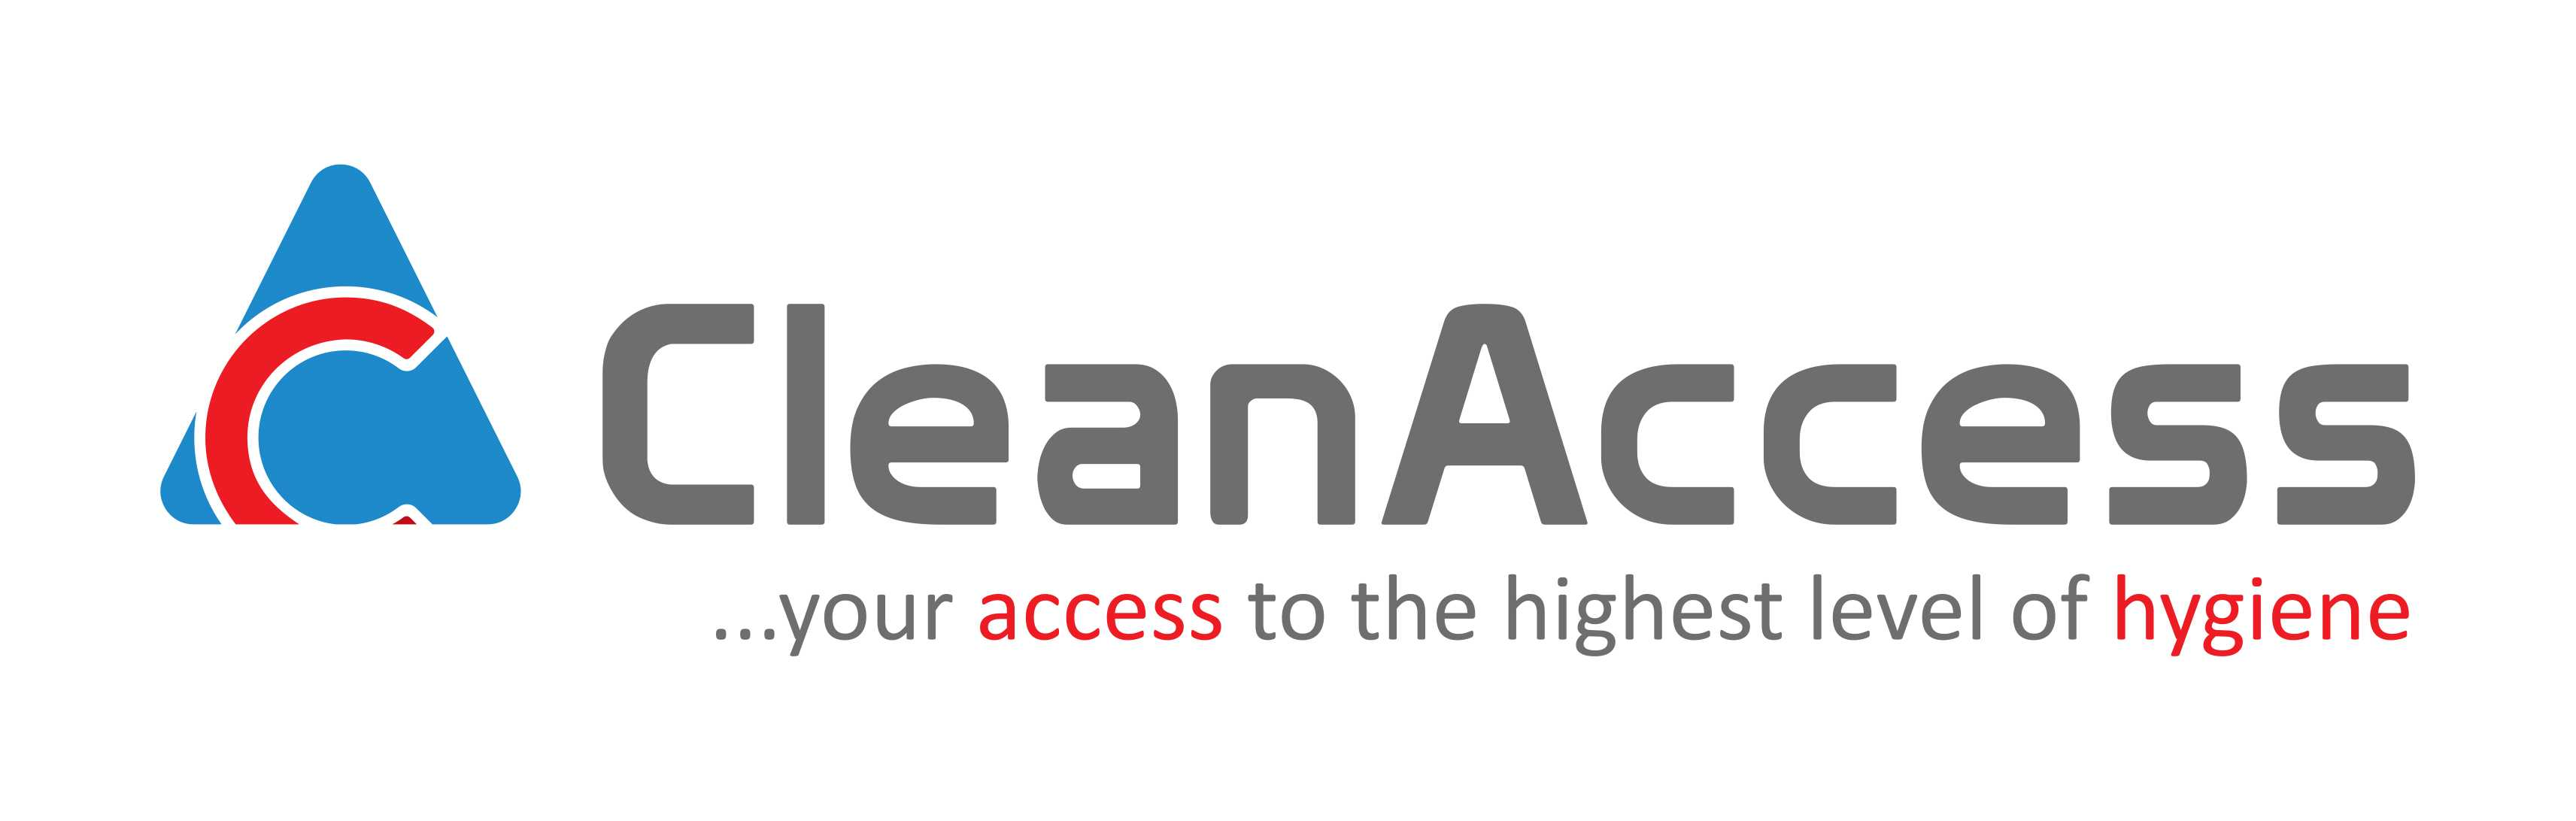 CleanAccess